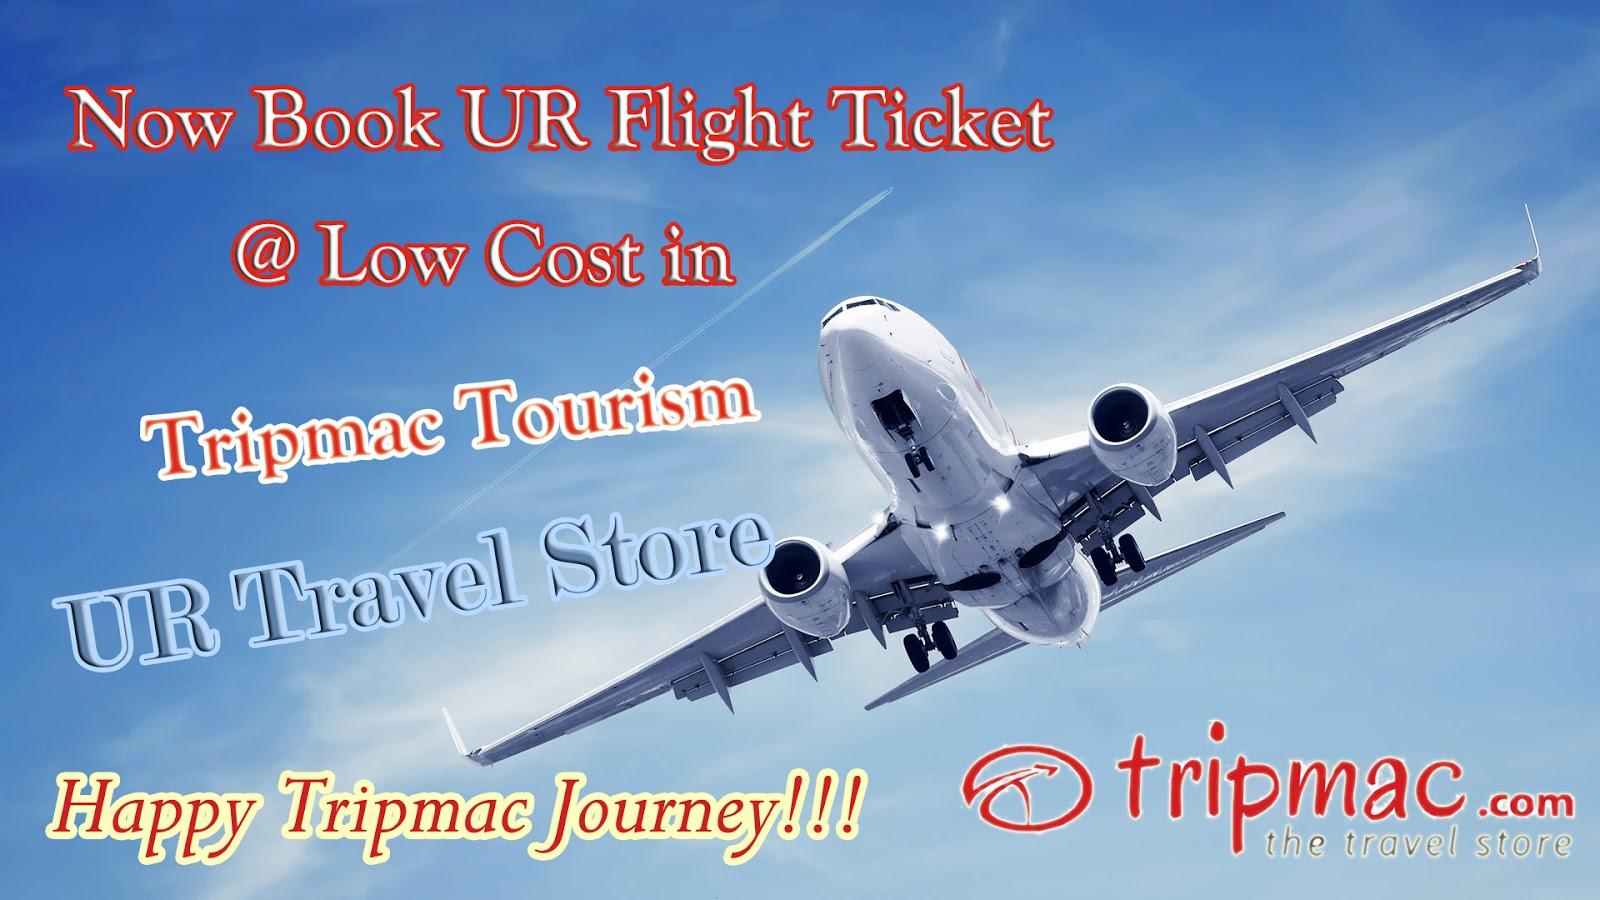 Tripmac Flights